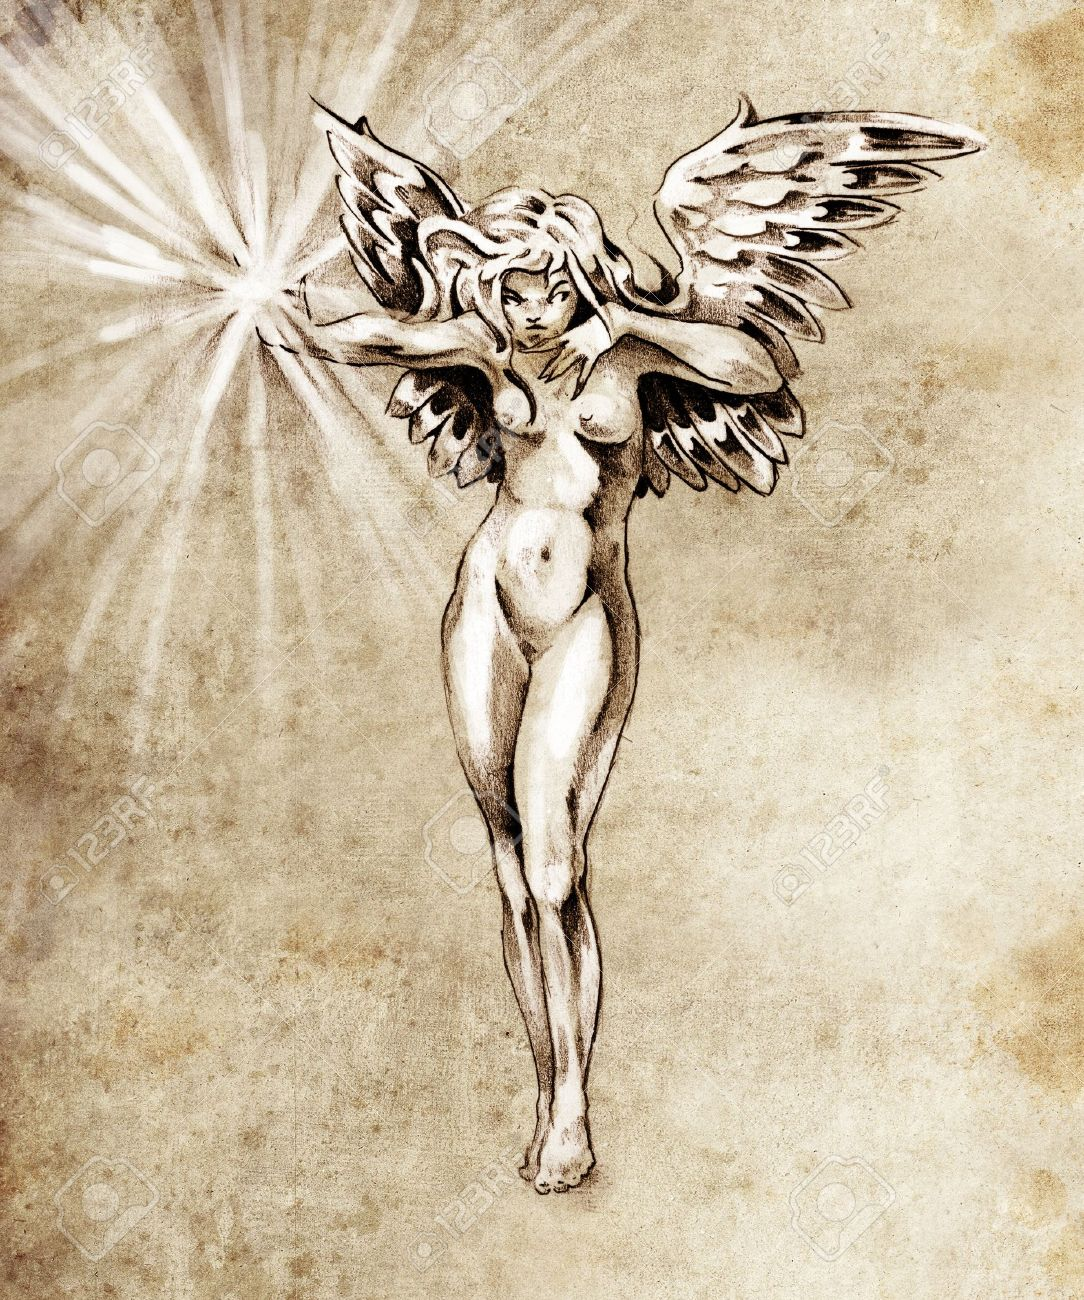 Nude fairies get penciled hentai scenes